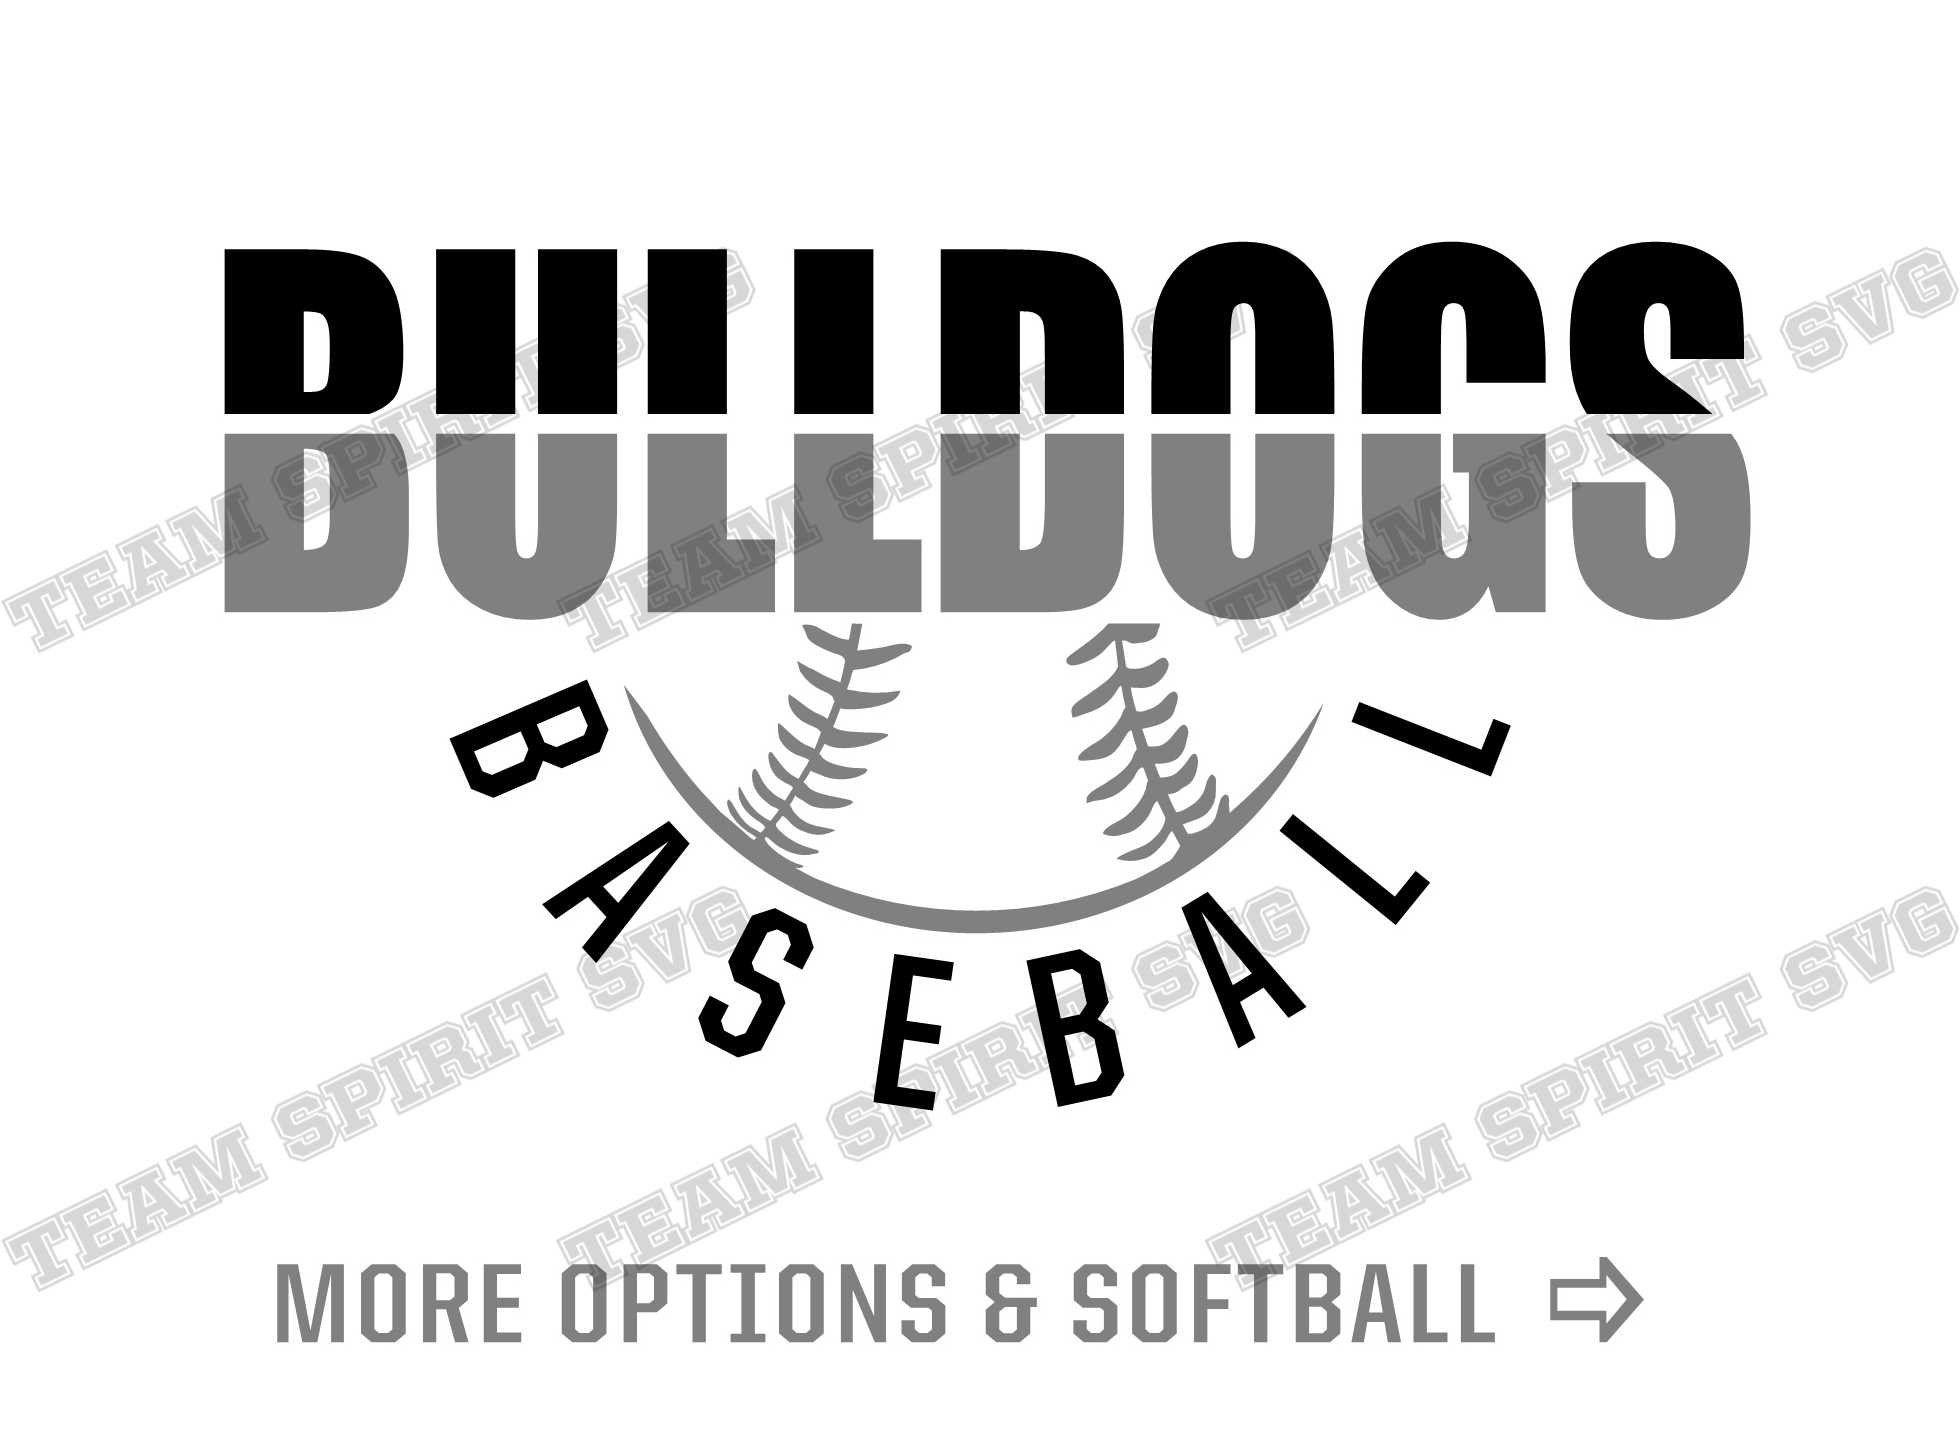 Bulldogs Baseball Svg Bulldog Softball Svg Download File Dxf Etsy In 2020 Softball Svg Baseball Svg Softball